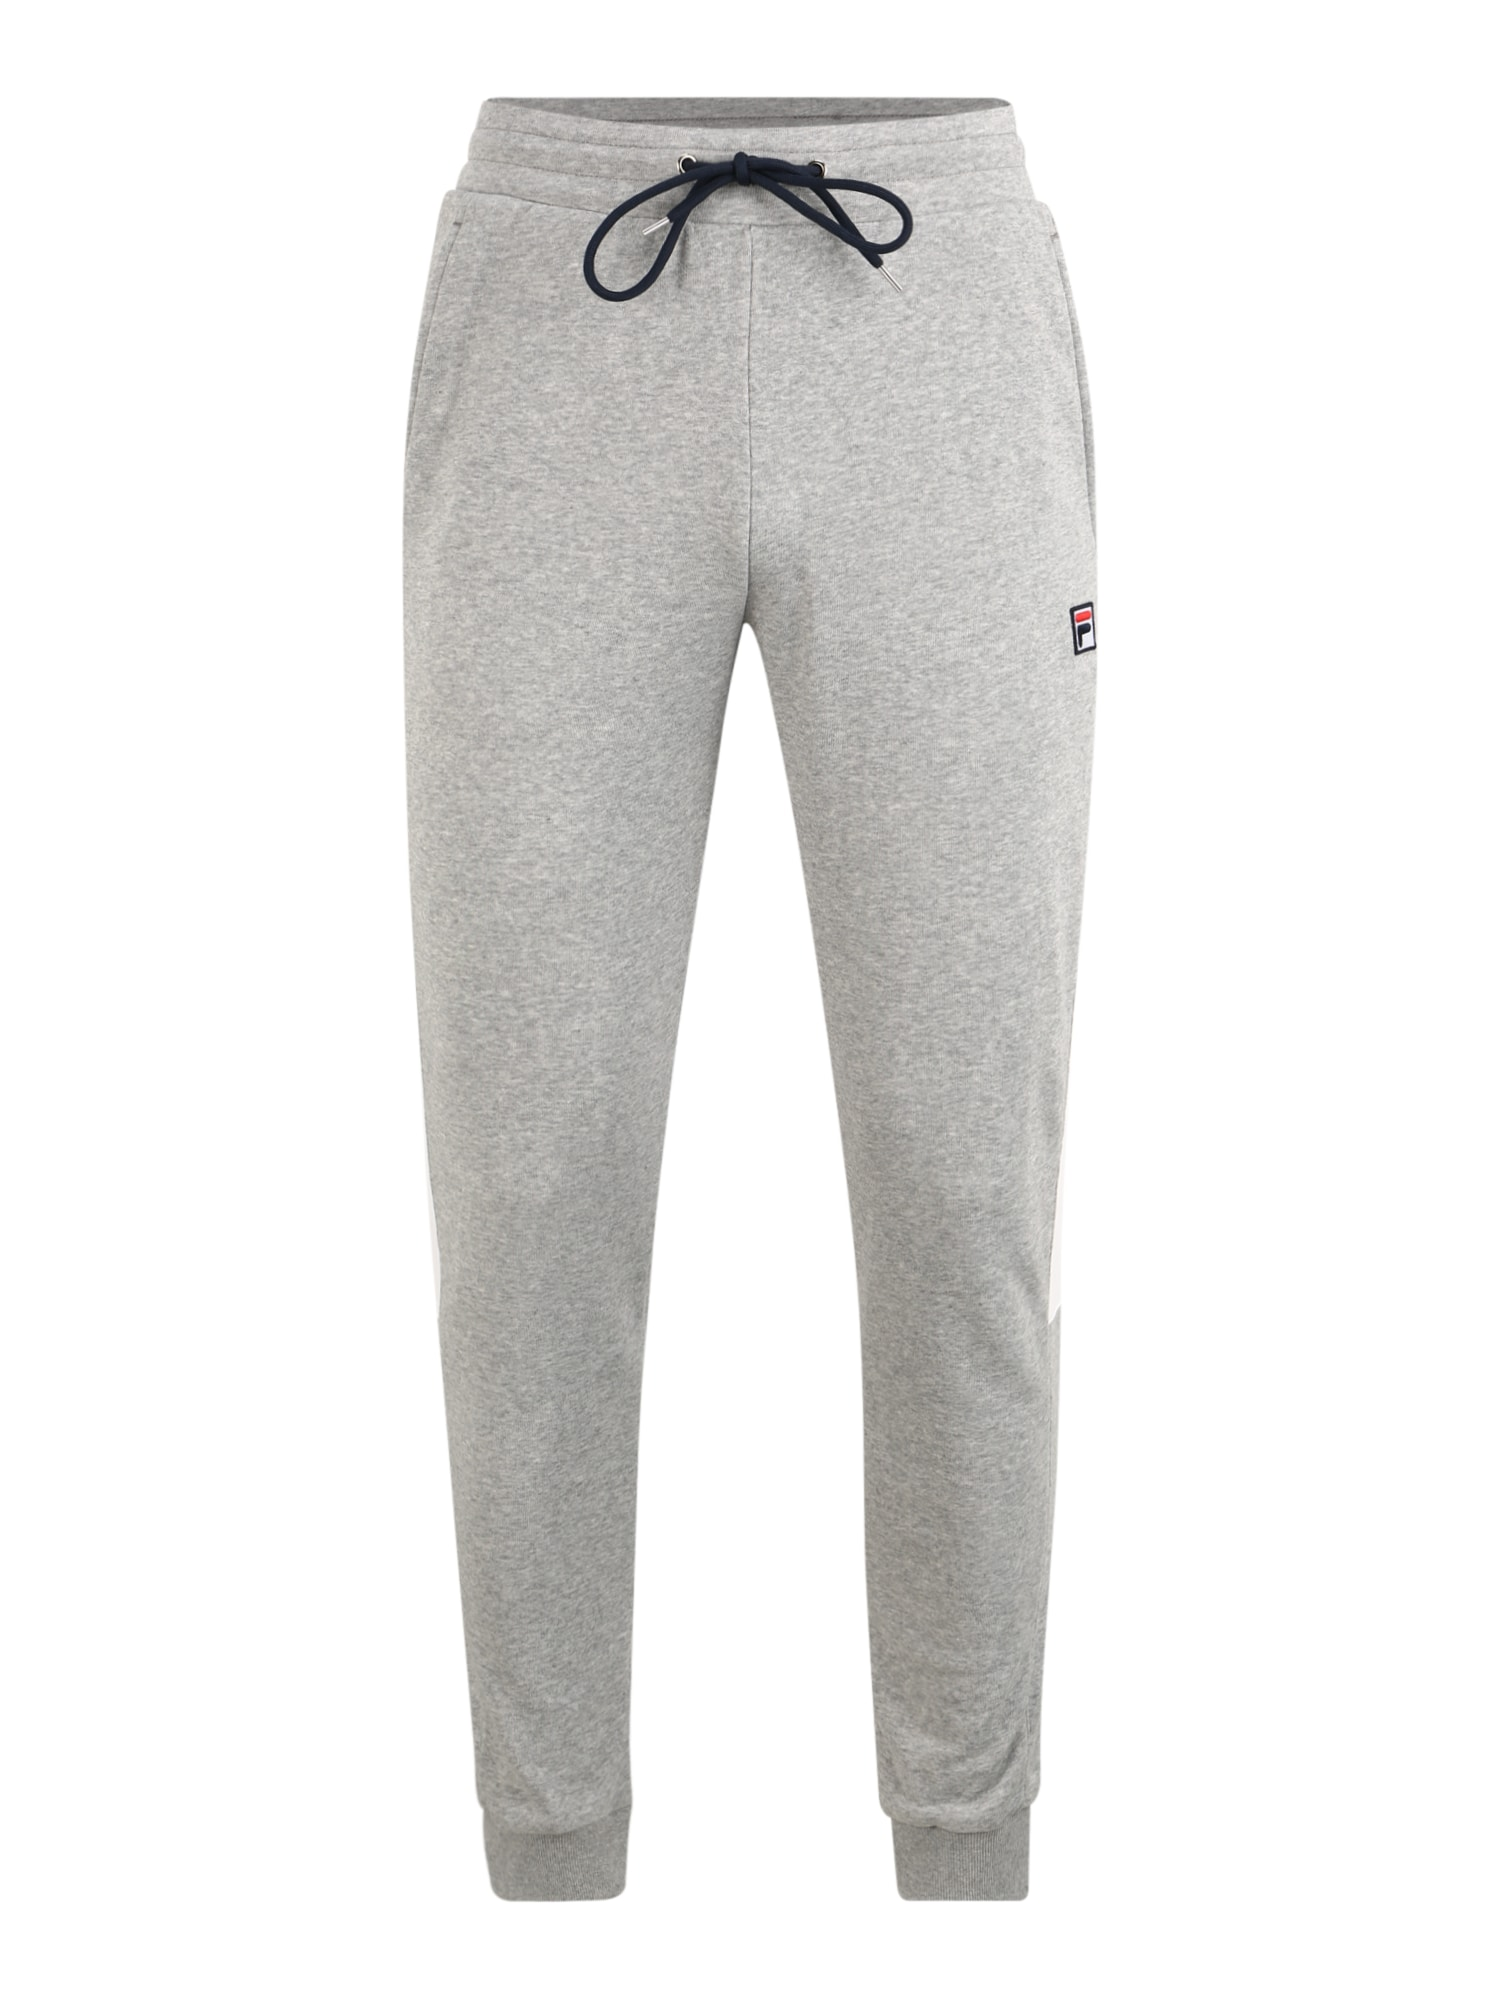 FILA Sportinės kelnės 'Freddie' pilka